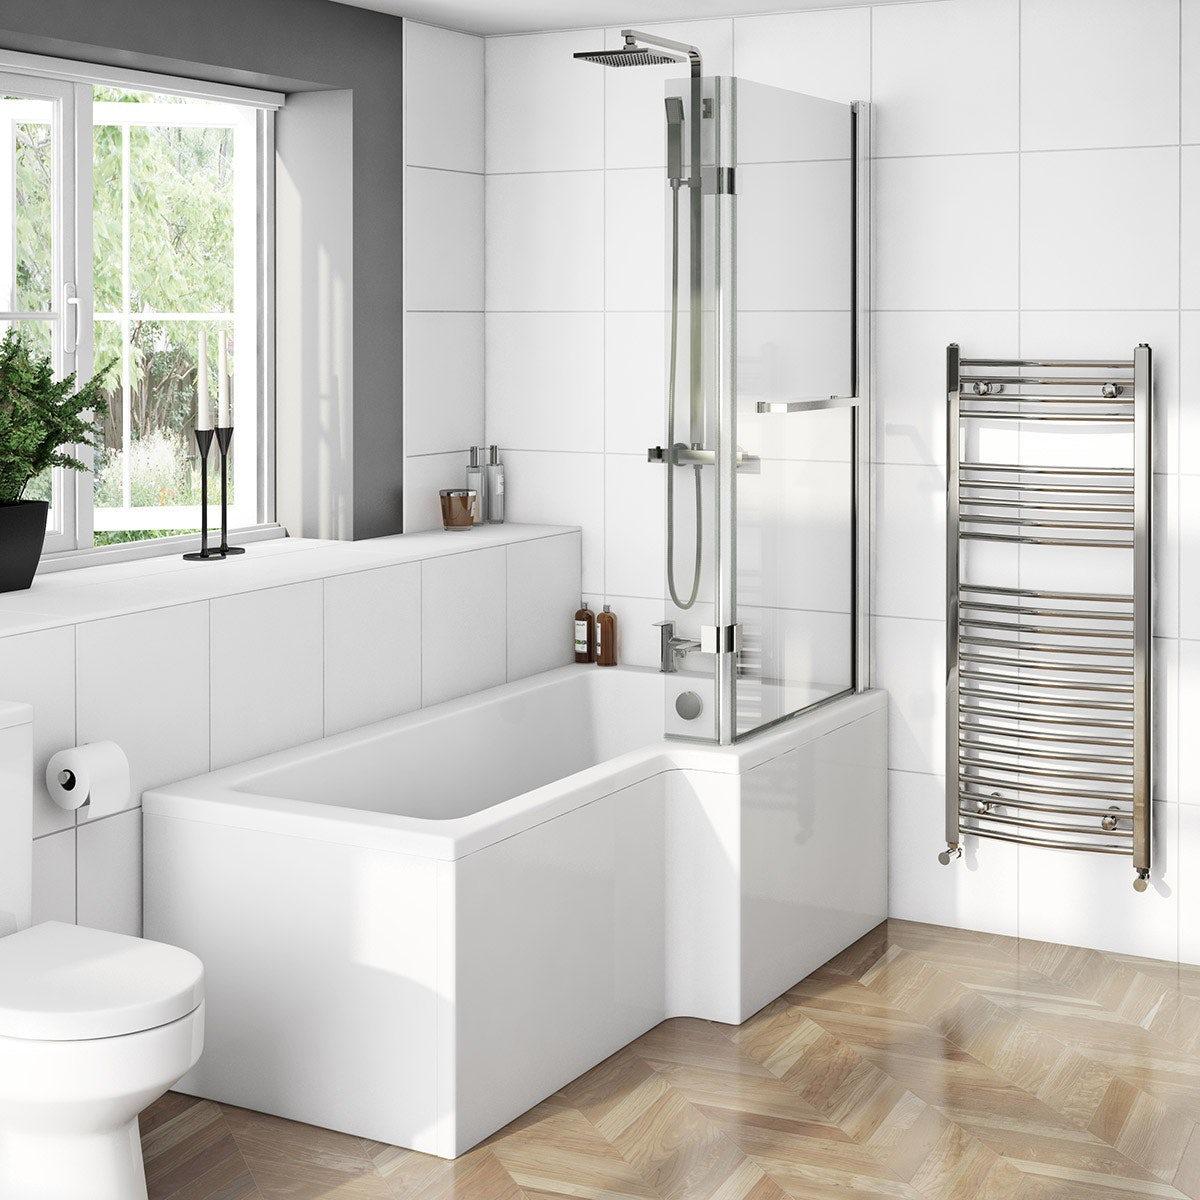 Boston Shower Bath 1700 x 850 RH inc. 8mm Hinged Screen with Towel Rail